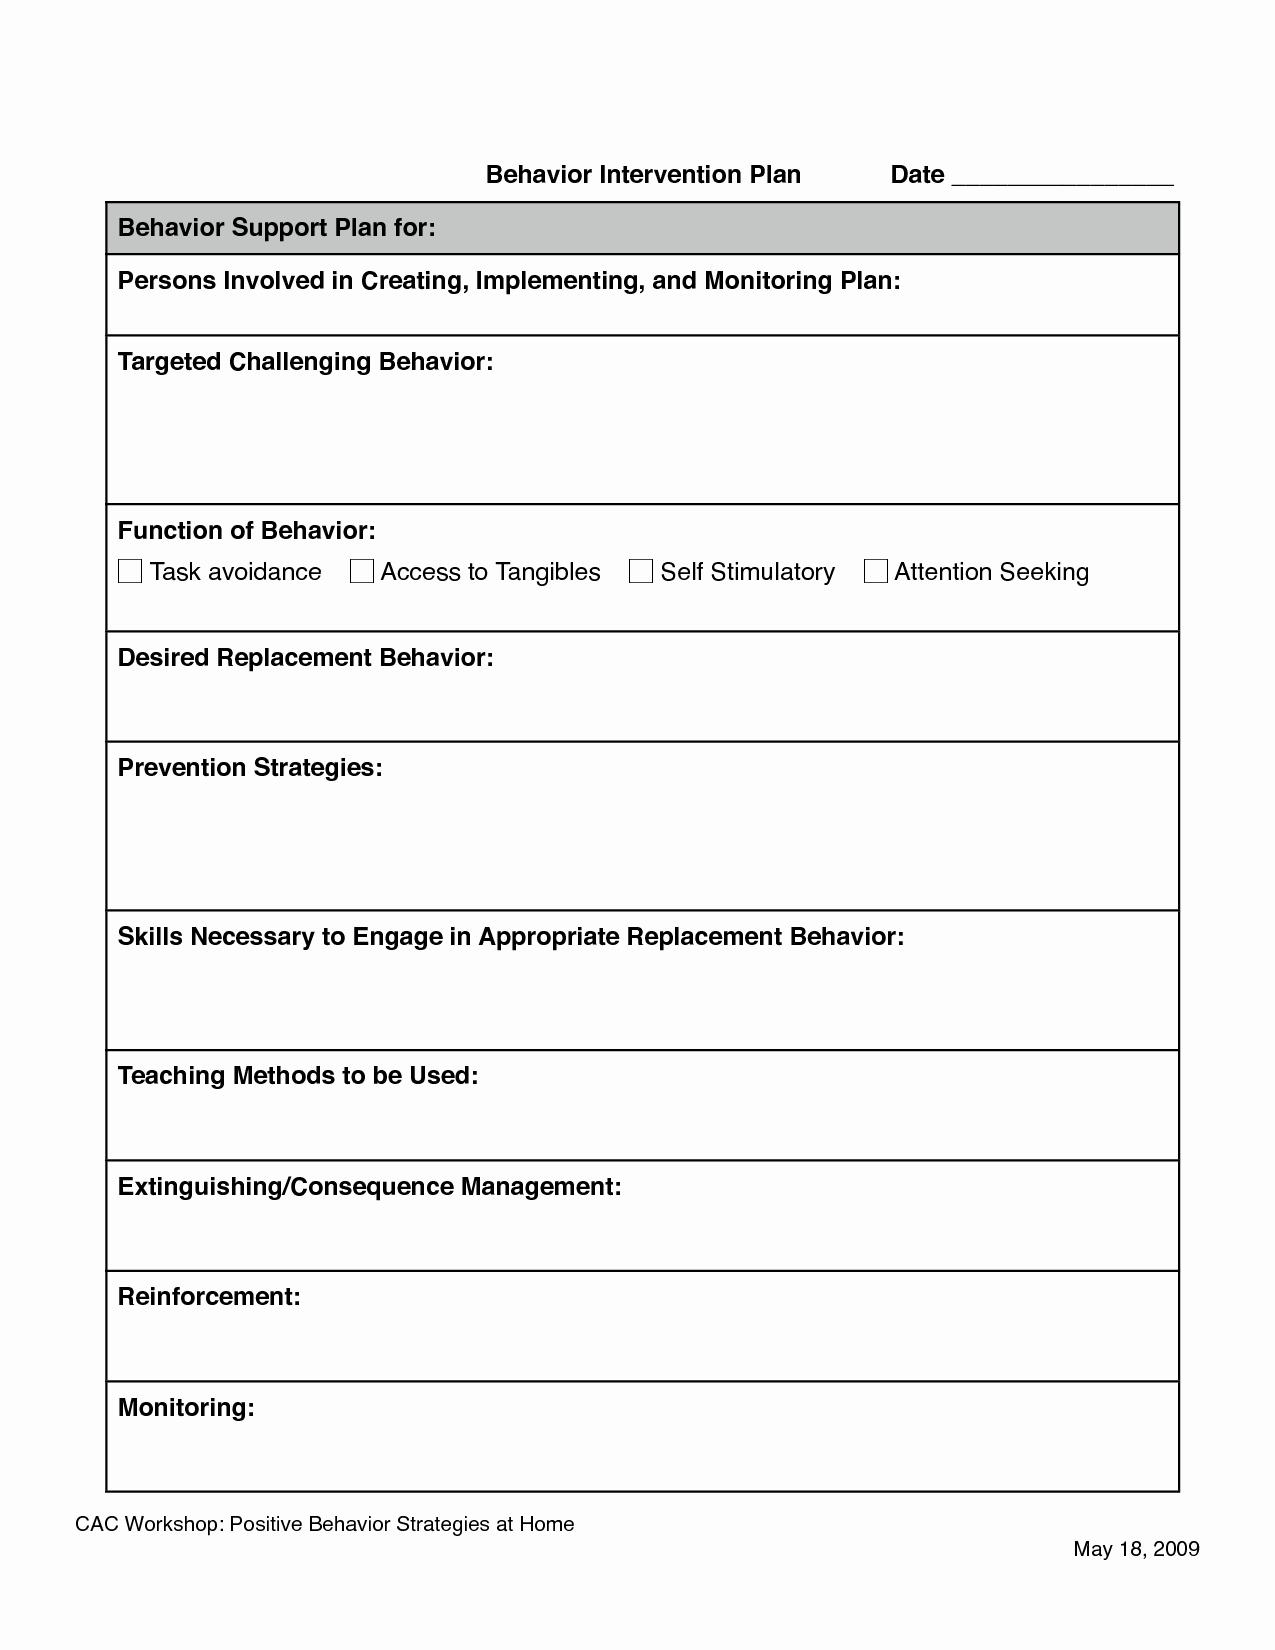 Behavior Intervention Plan Example Inspirational Behavior Intervention Plan Template